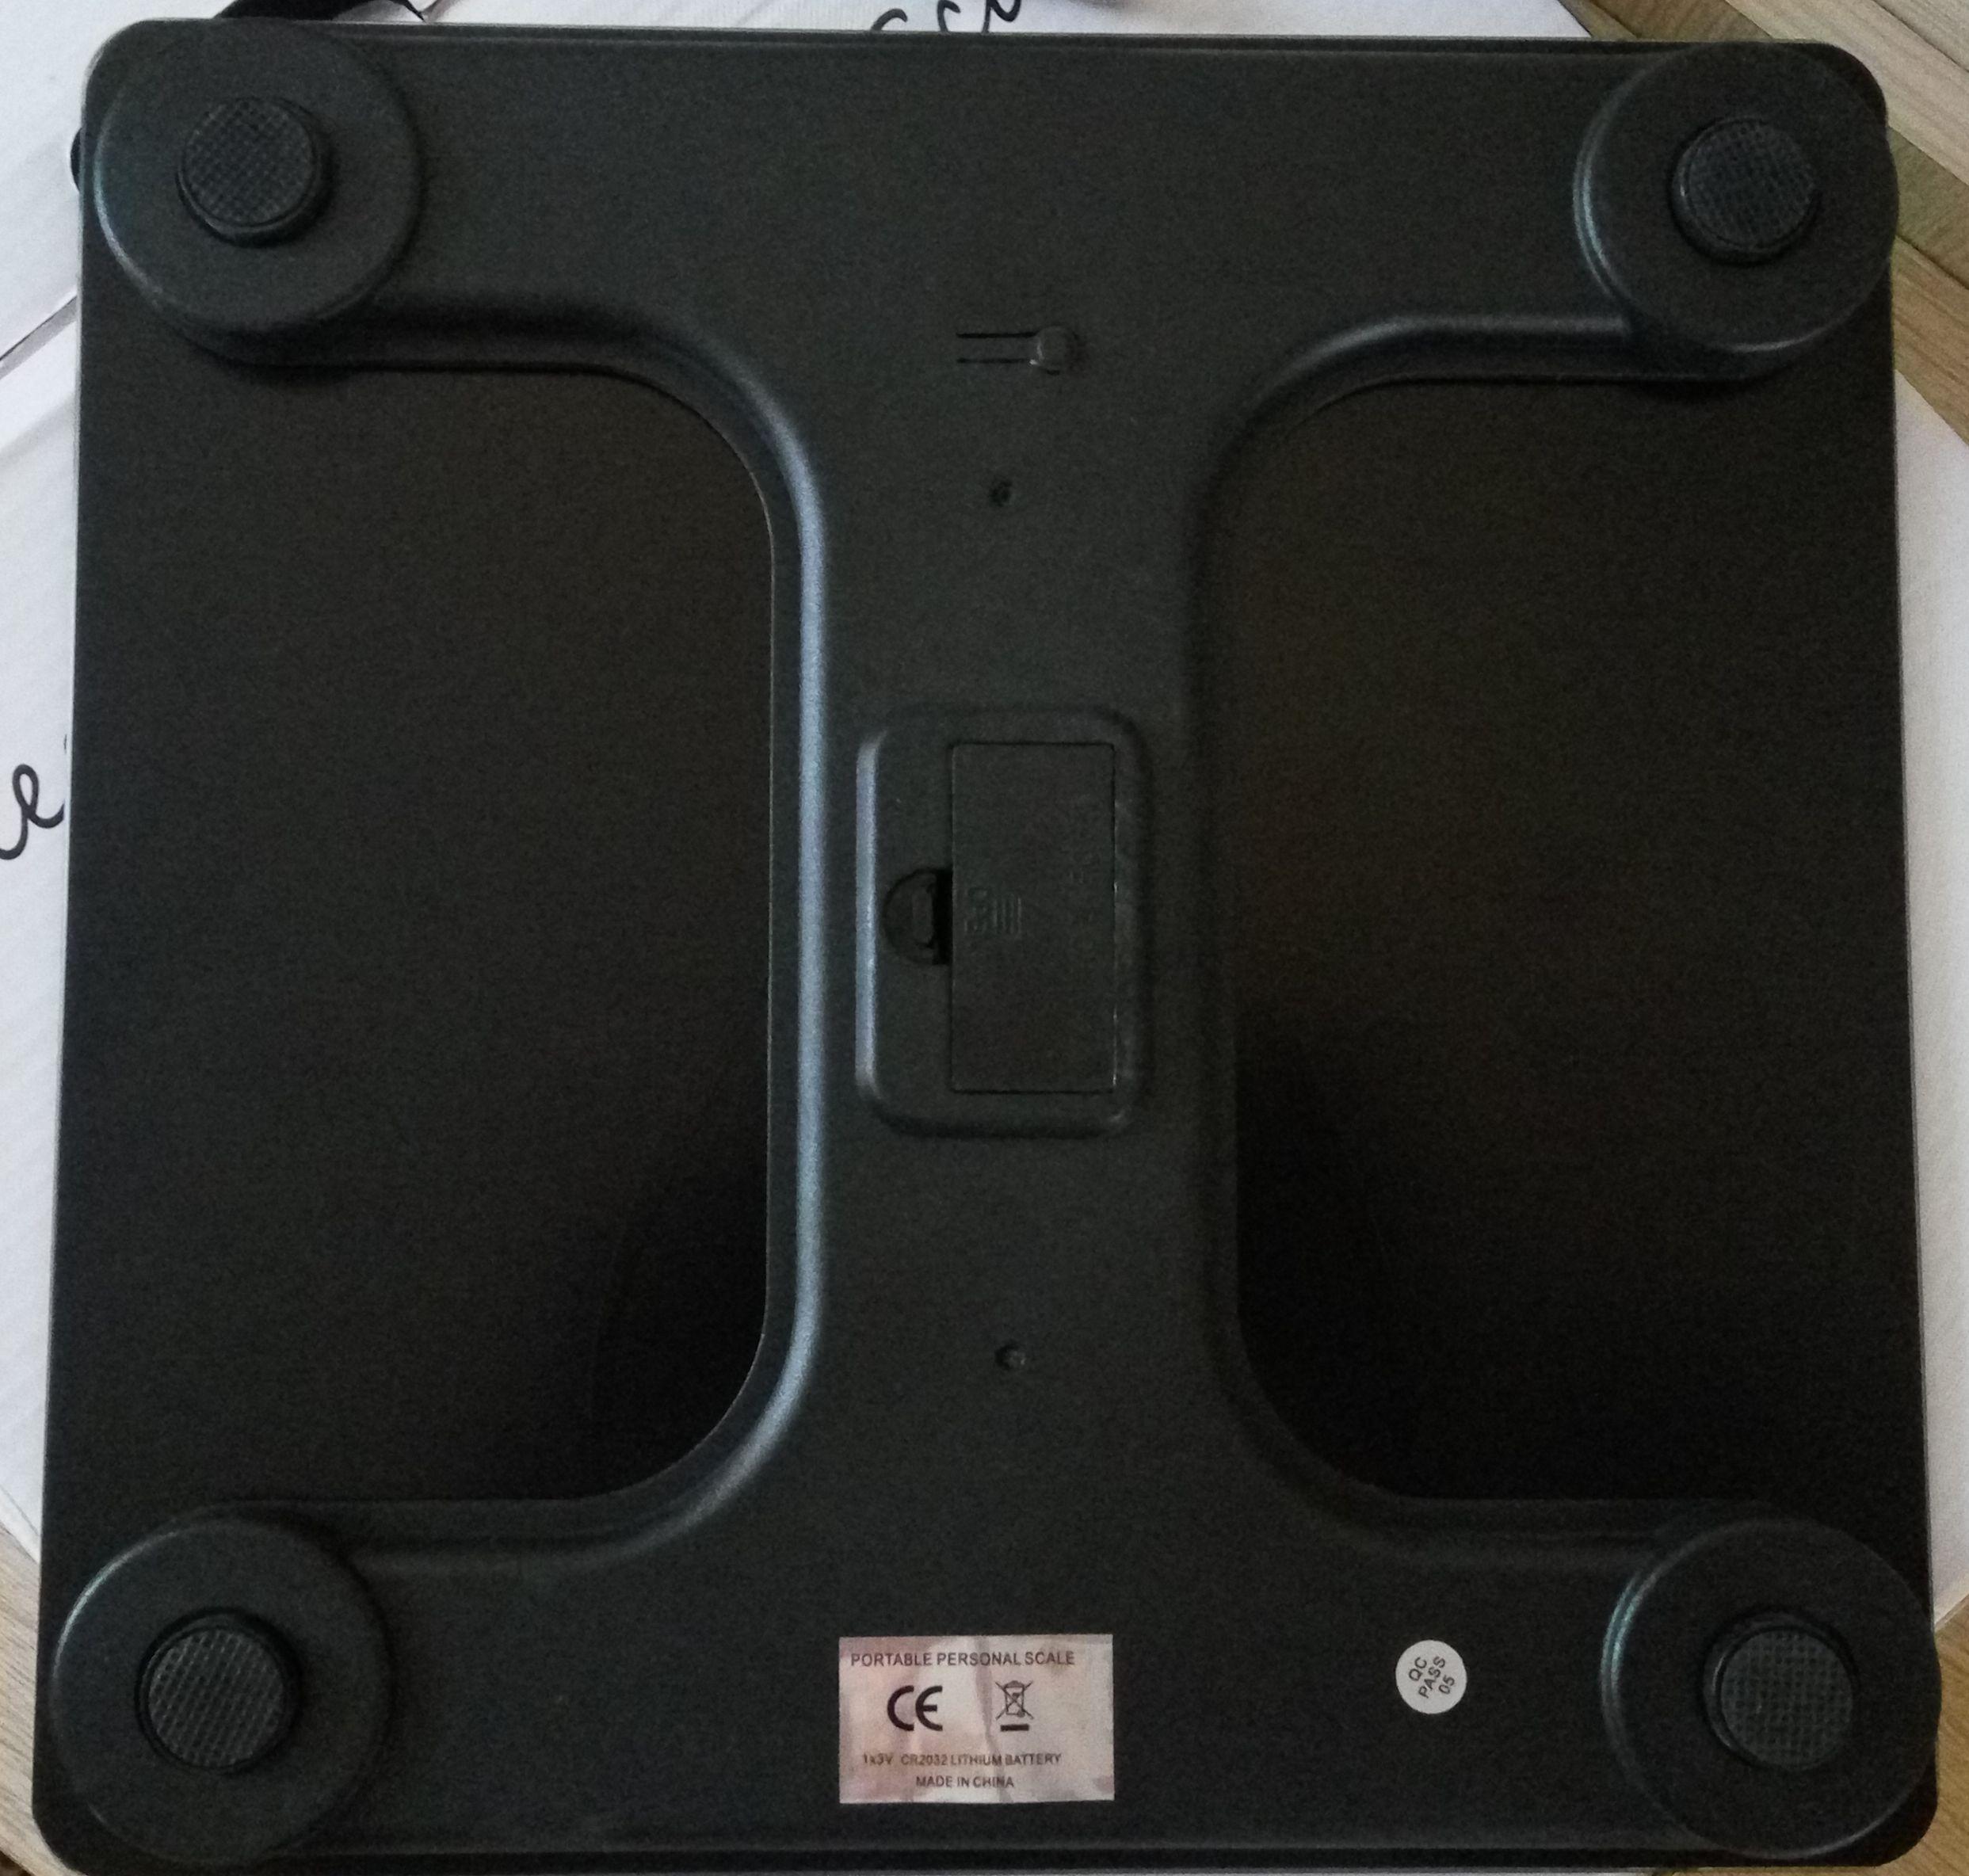 SDARISB Bathroom Scales Floor Body Smart Electric Digital Weight Health Balance Scale Toughened Glass LCD Display 180kg/50g|Bathroom Scales|   - AliExpress